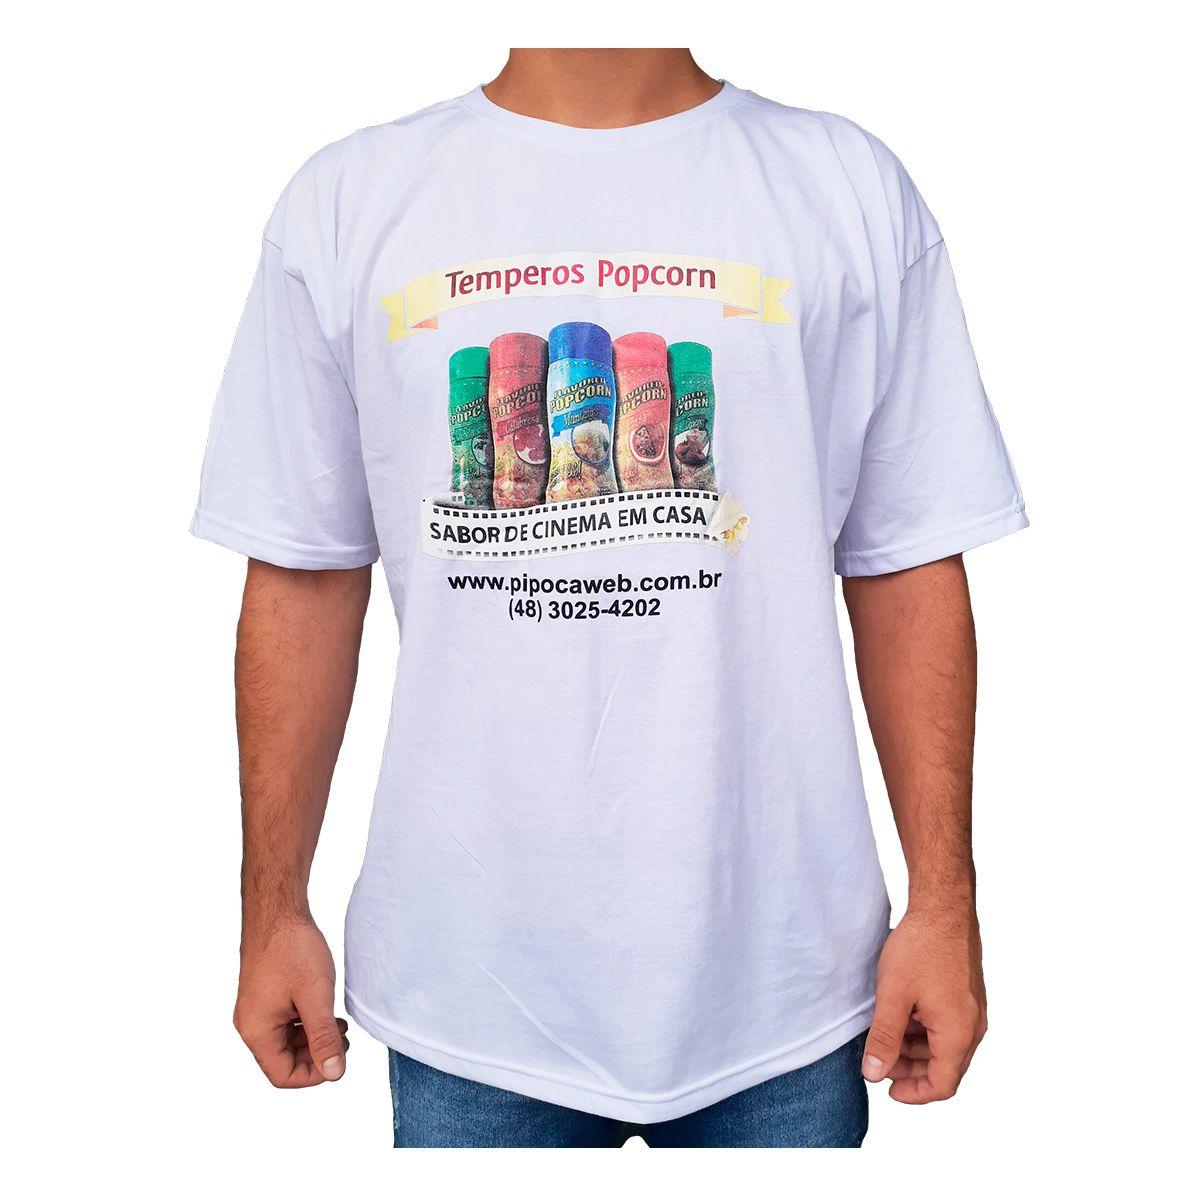 Camisa Popcorn